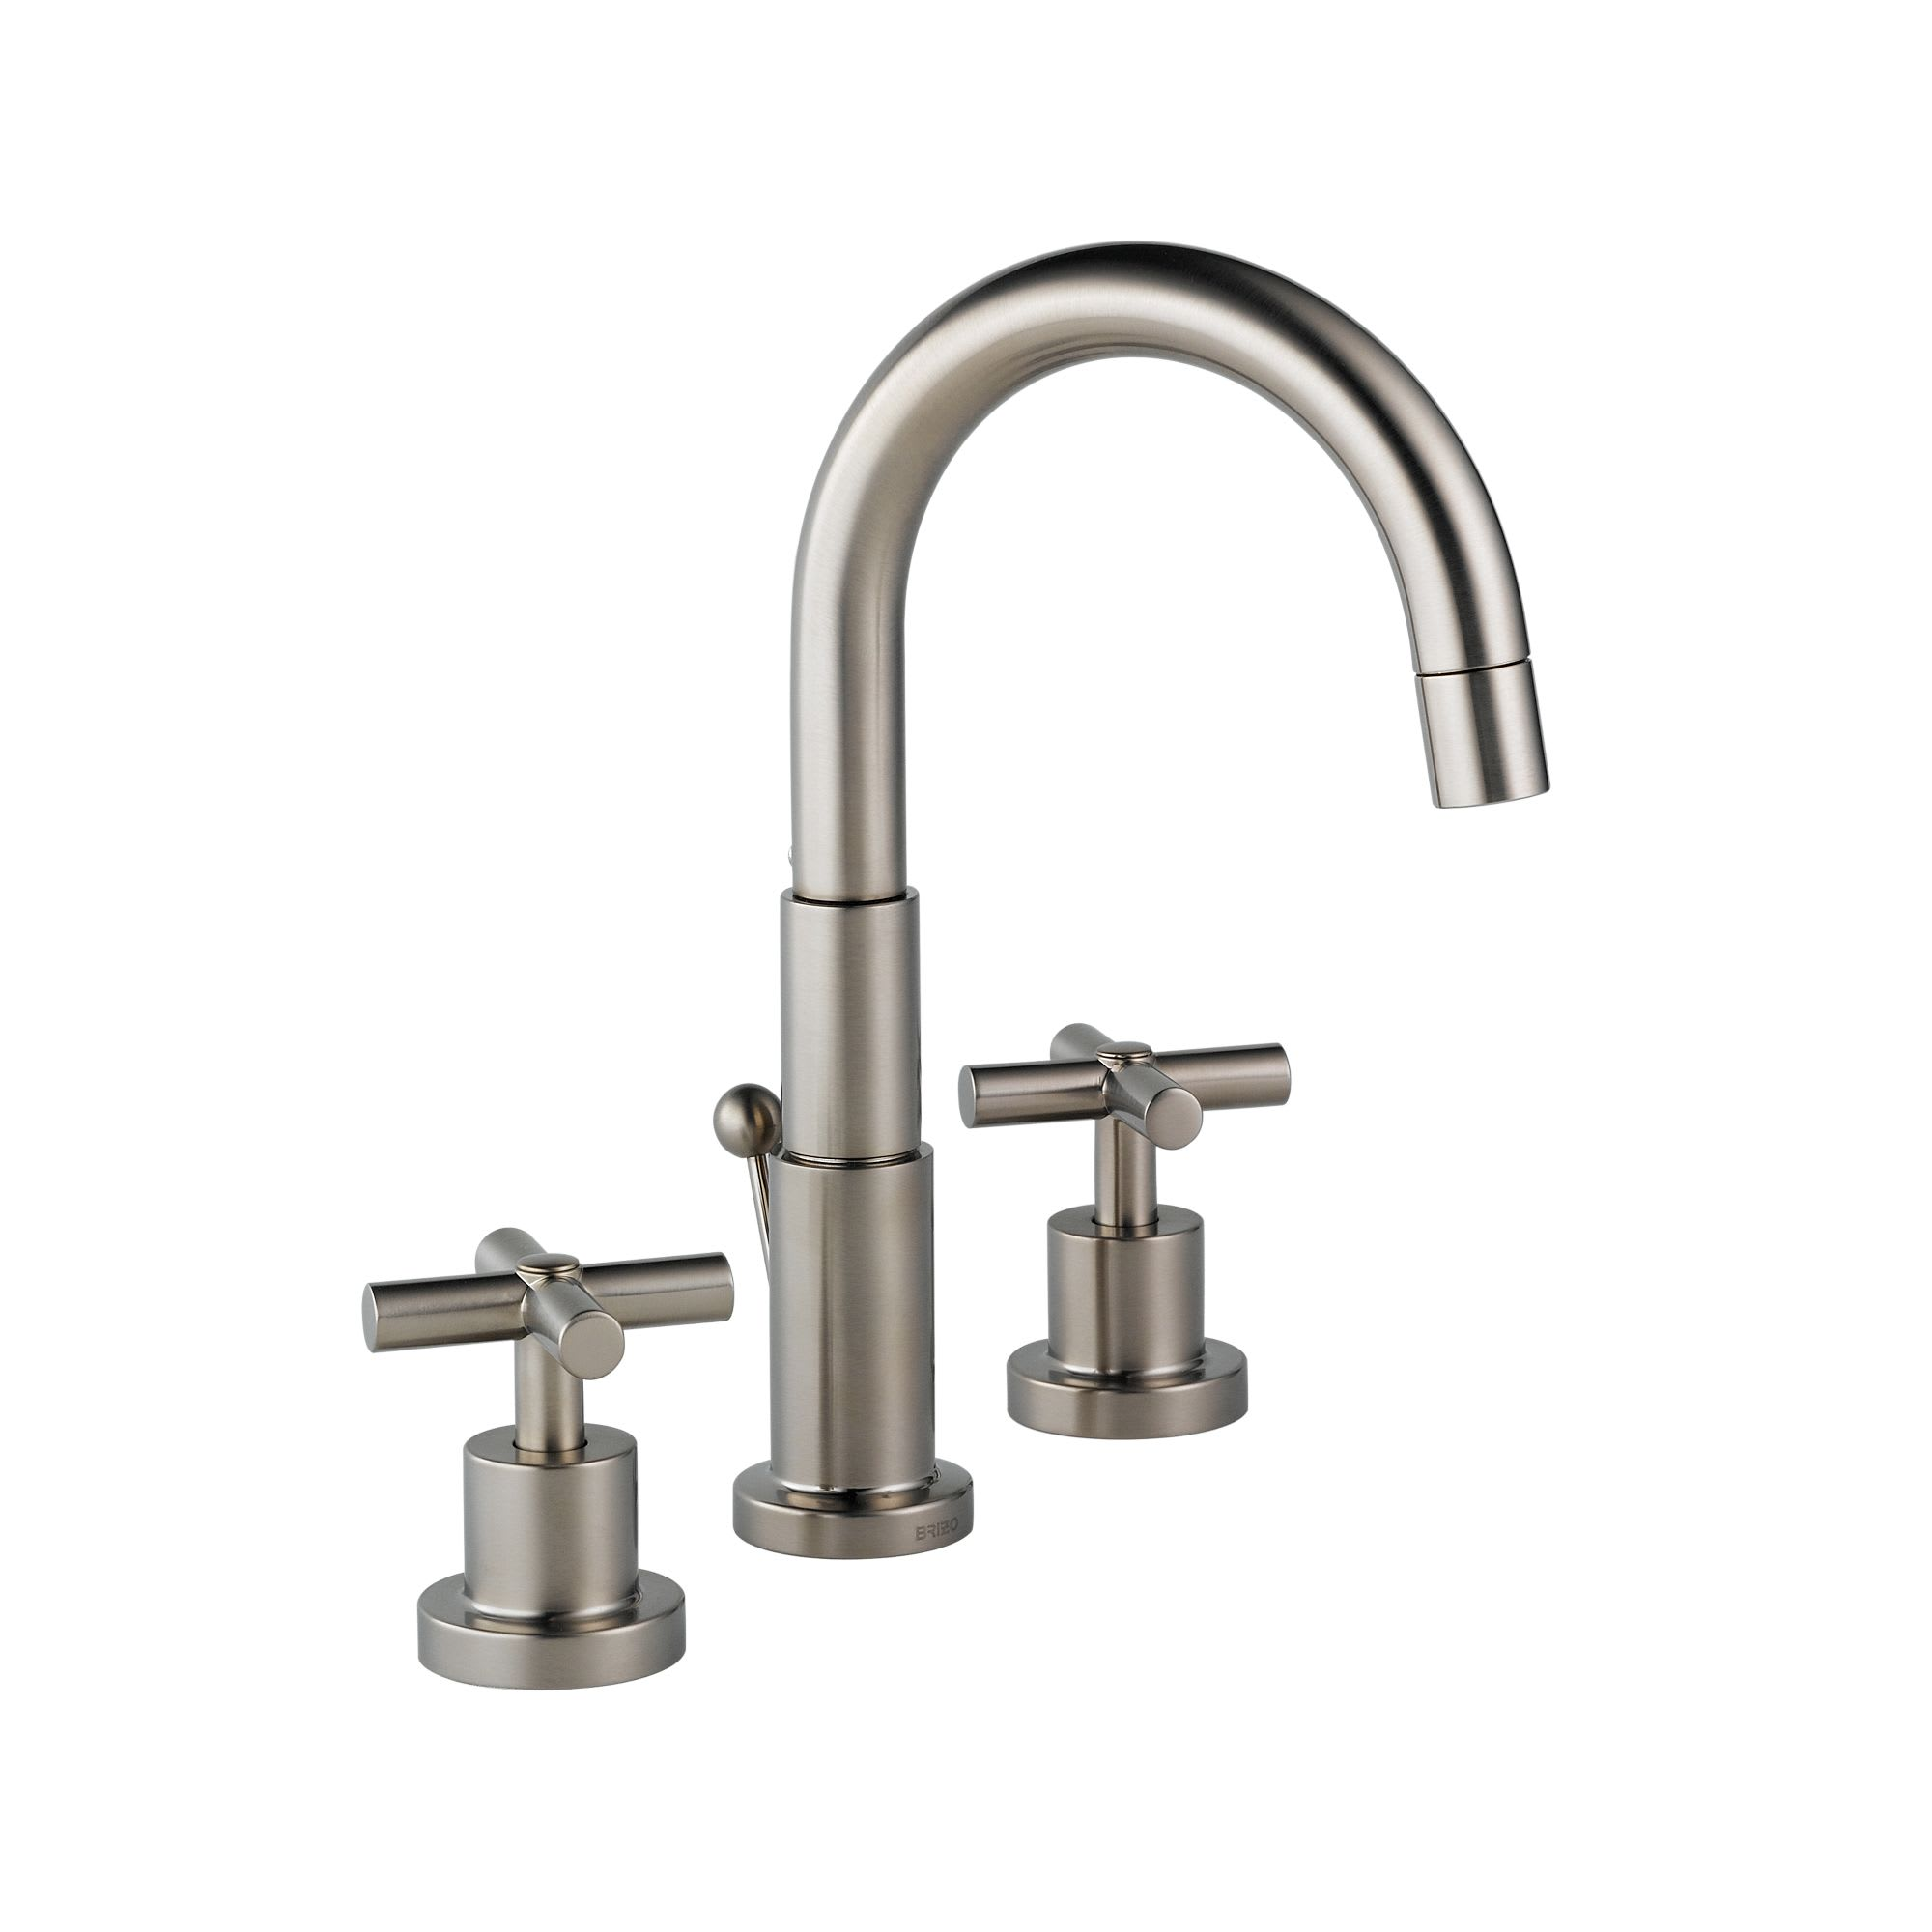 Brizo 6516017-BN Brushed Nickel Bathroom Faucet Double Handle ...